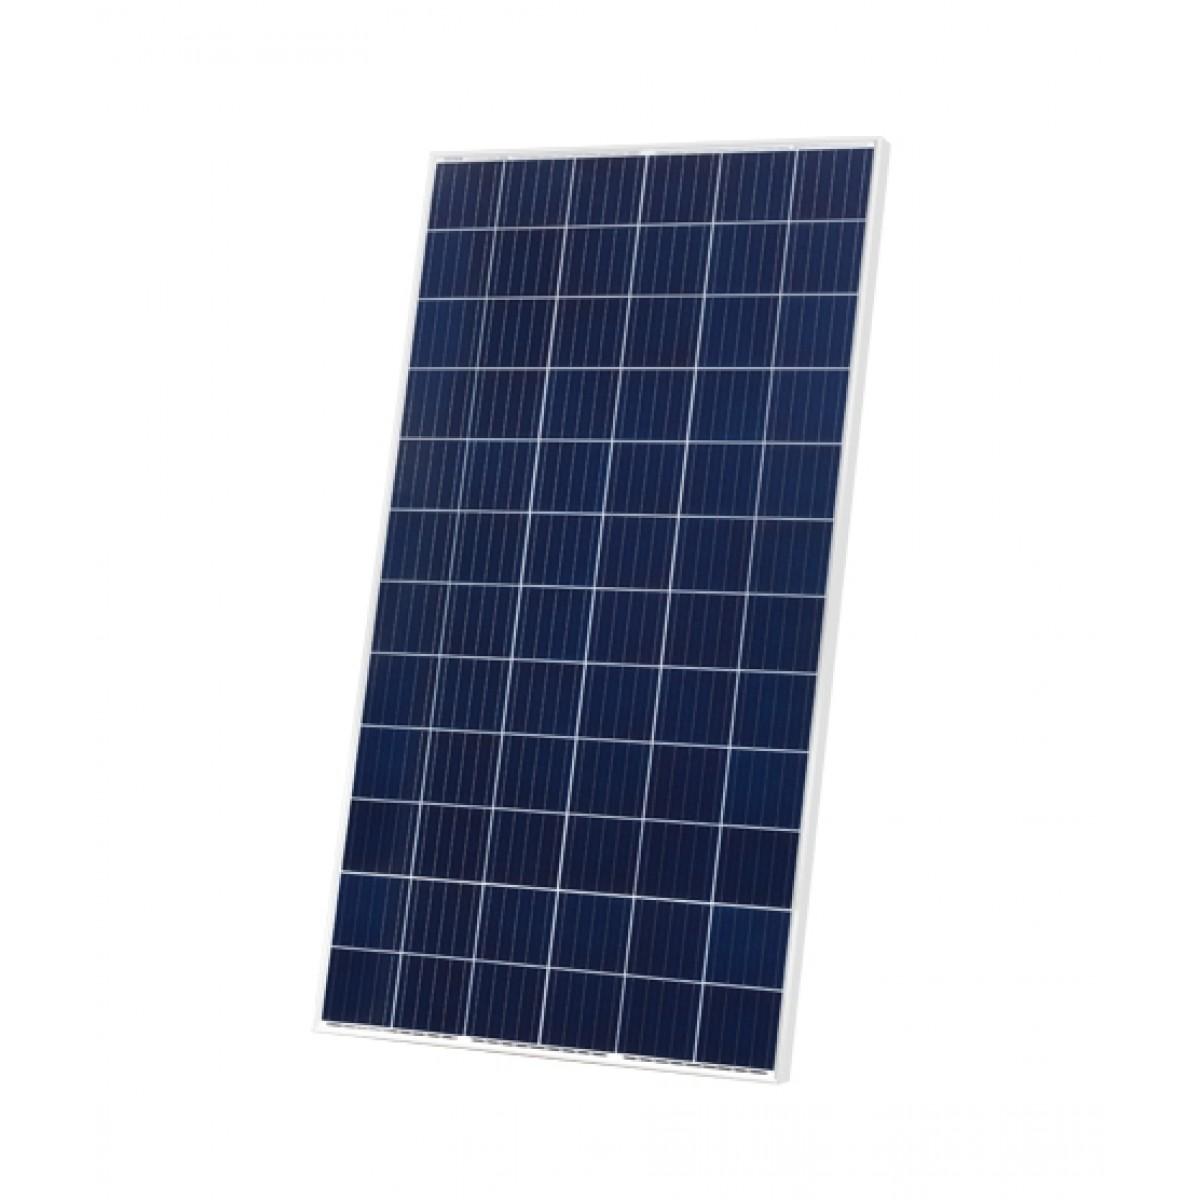 Jinko Eagle 72 Solar Panel 340 Watt 72 Cell Module Price In Pakistan Buy Jinko Eagle 72 Solar Panel 340 Watt 72 Cell Module Ishopping Pk